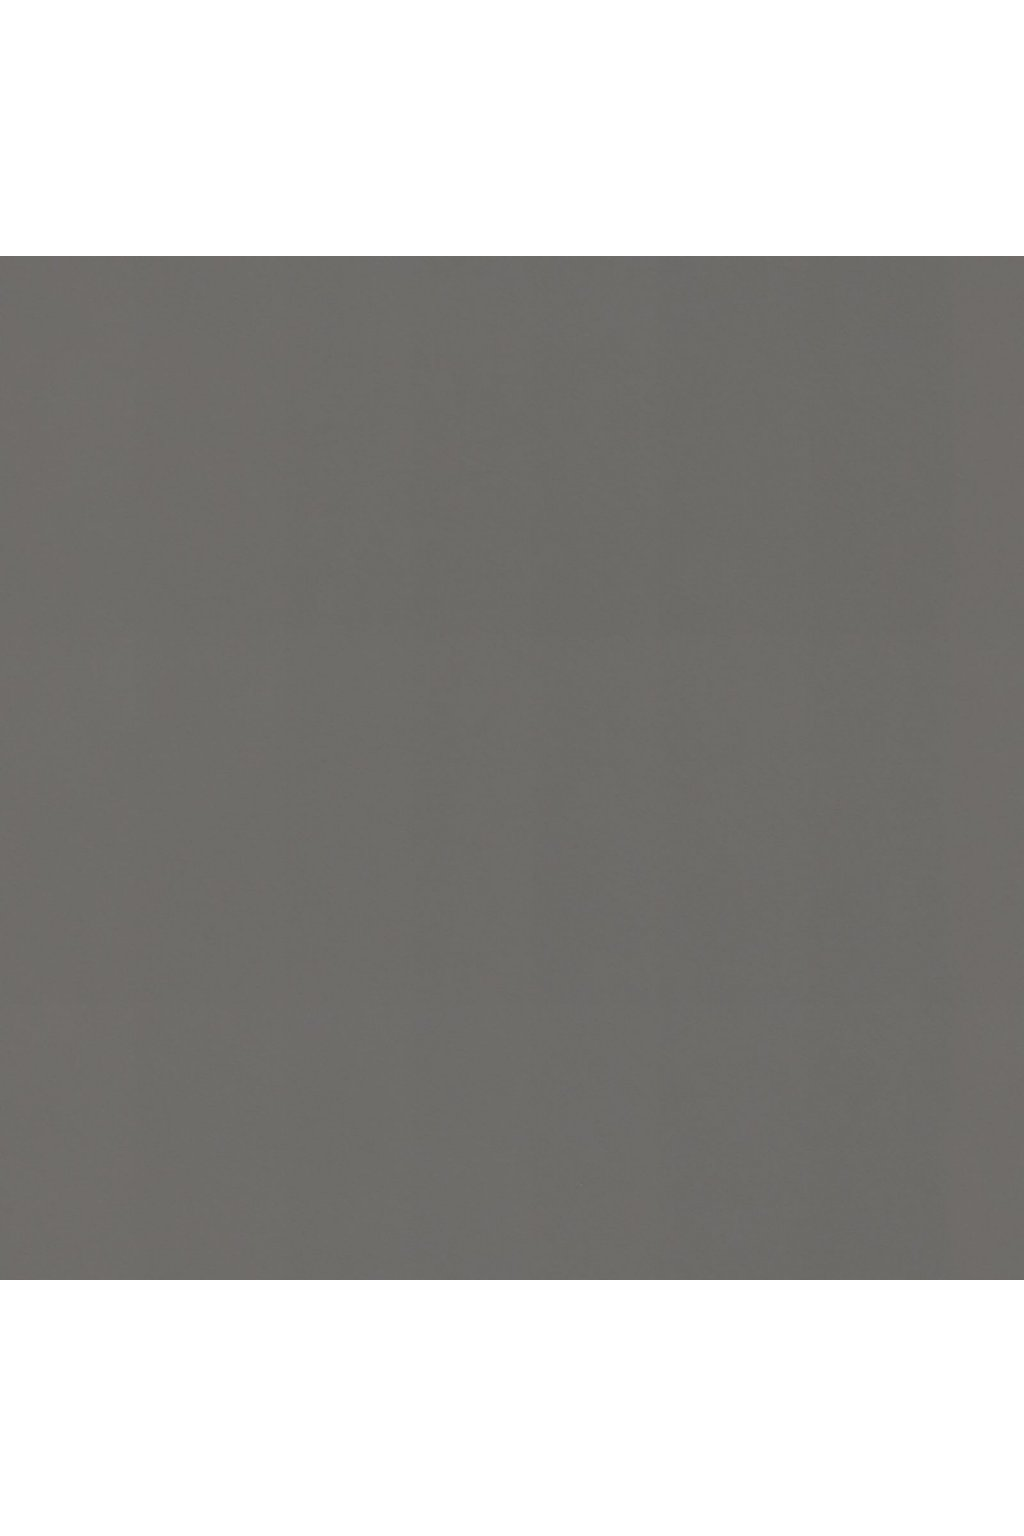 Pracovní deska Dark Grey 28mm